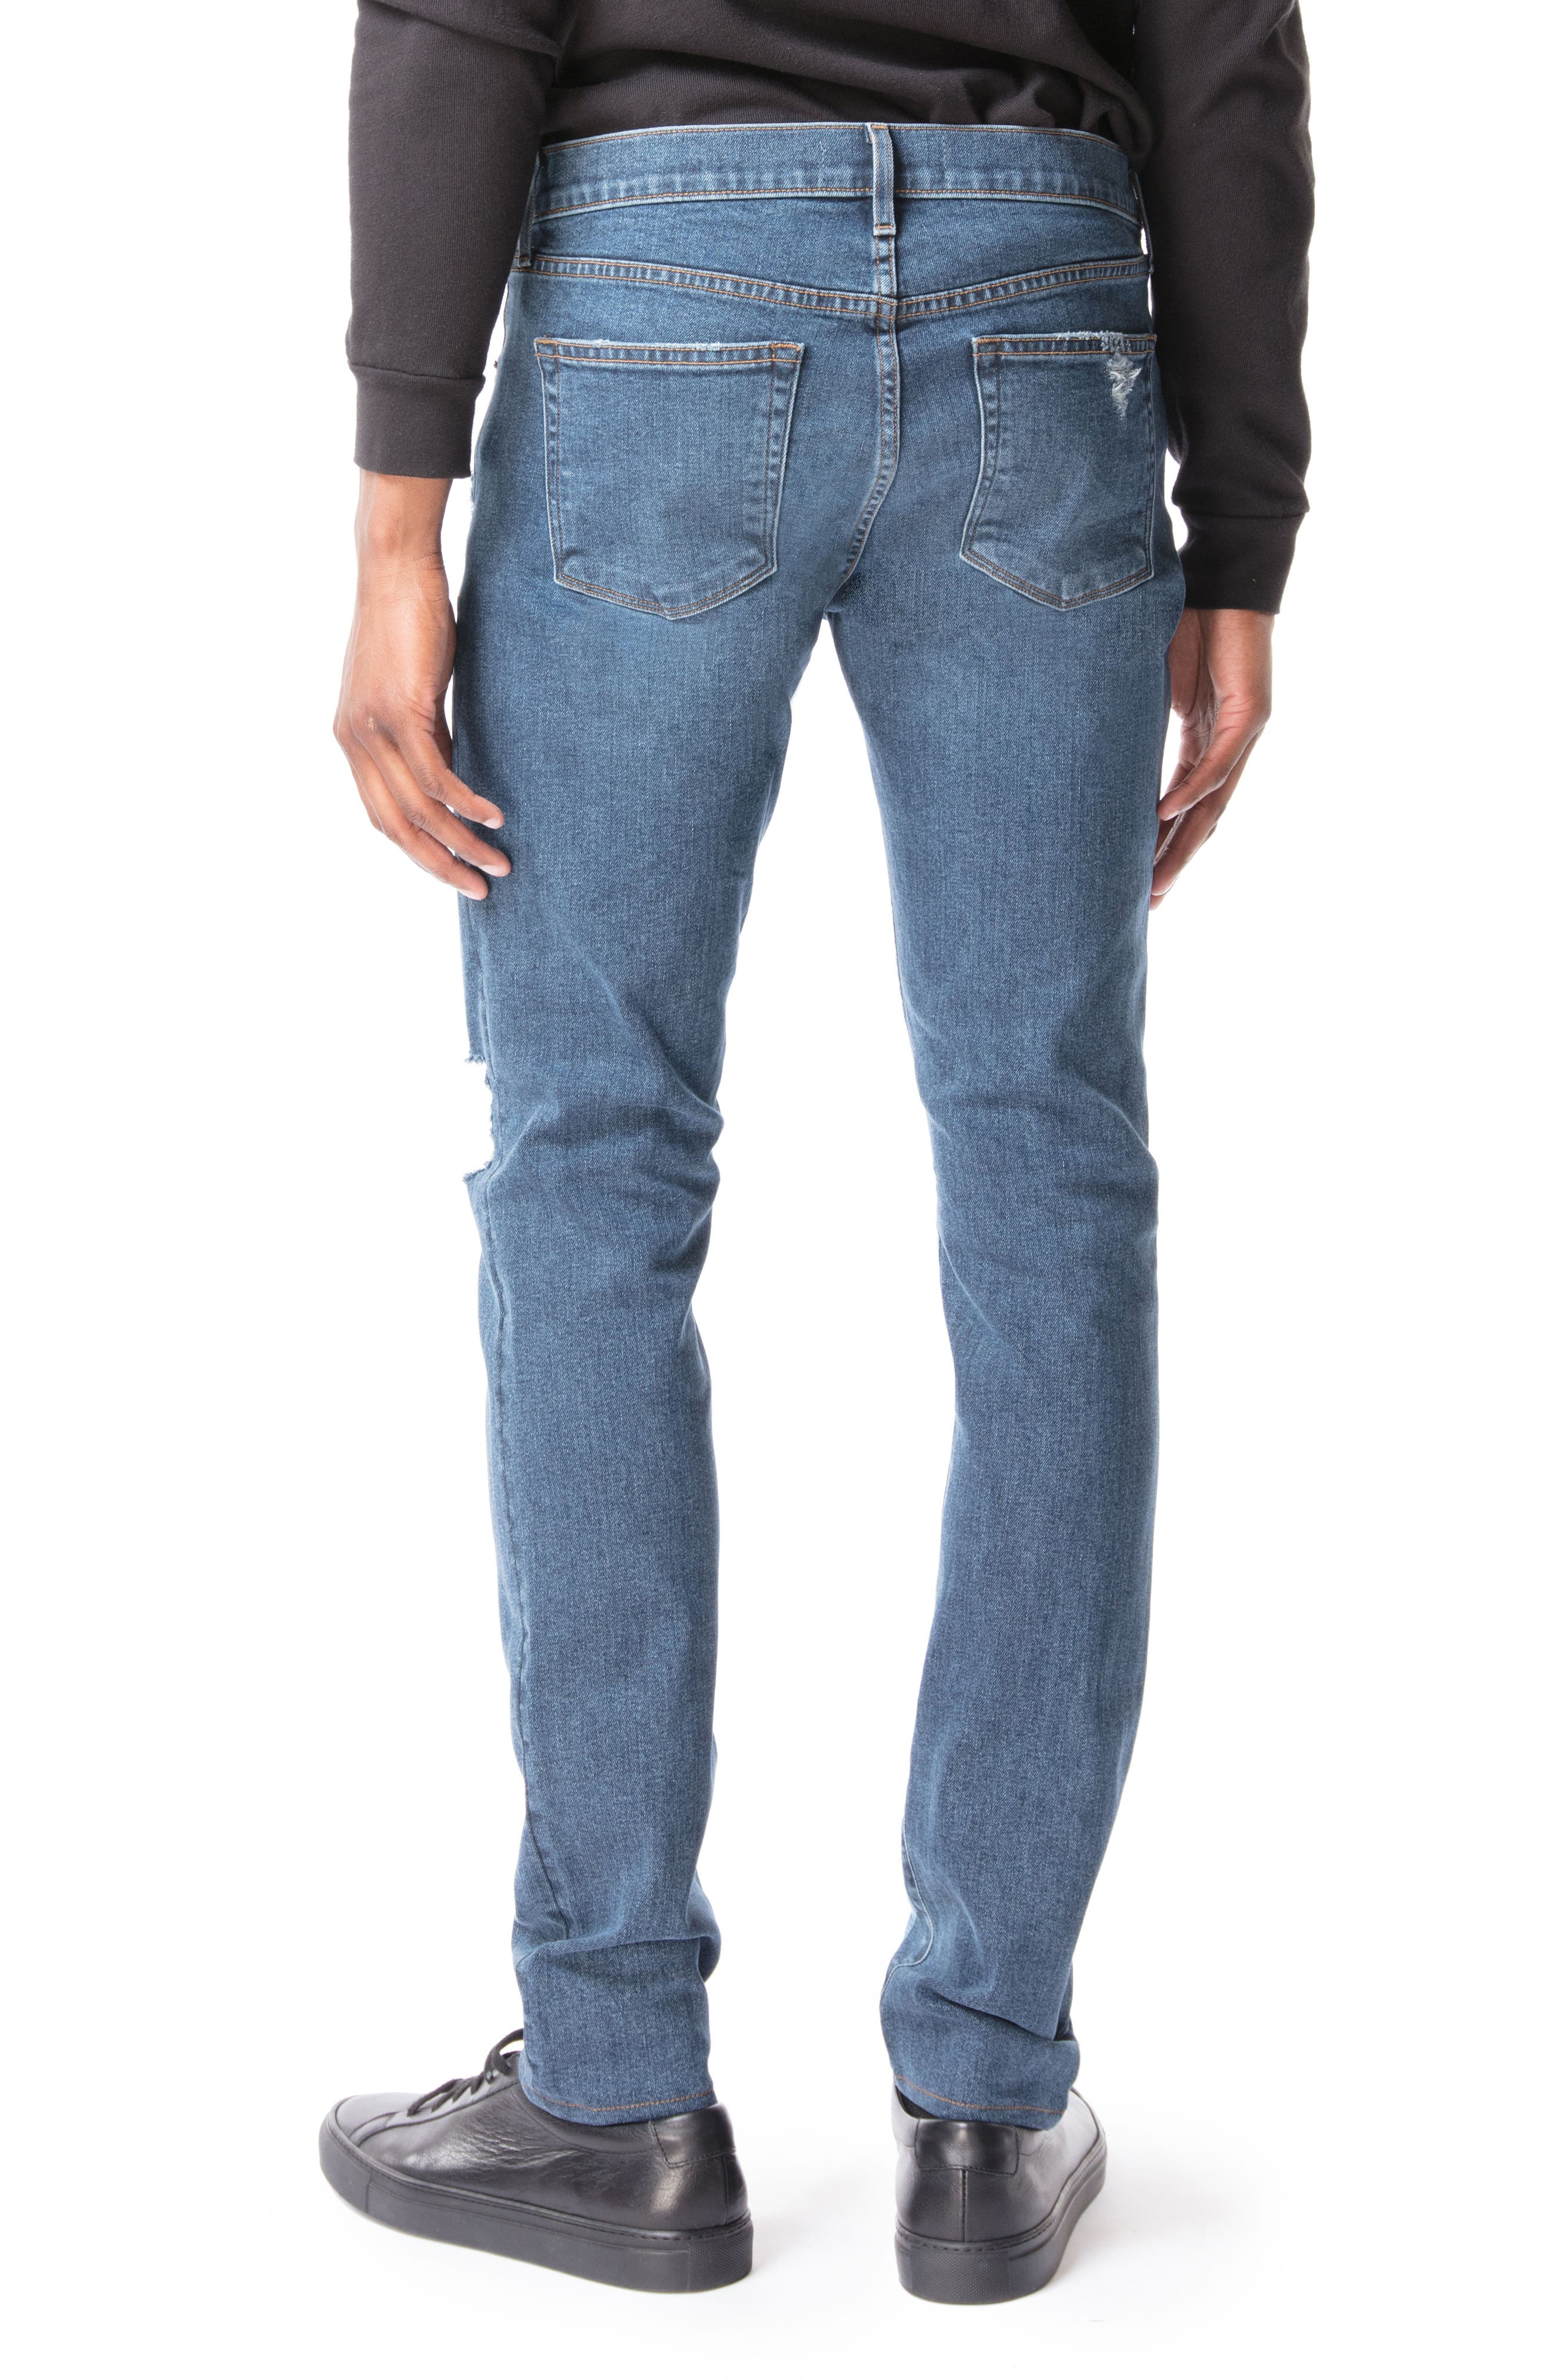 Mick Skinny Fit Jeans,                             Alternate thumbnail 2, color,                             494